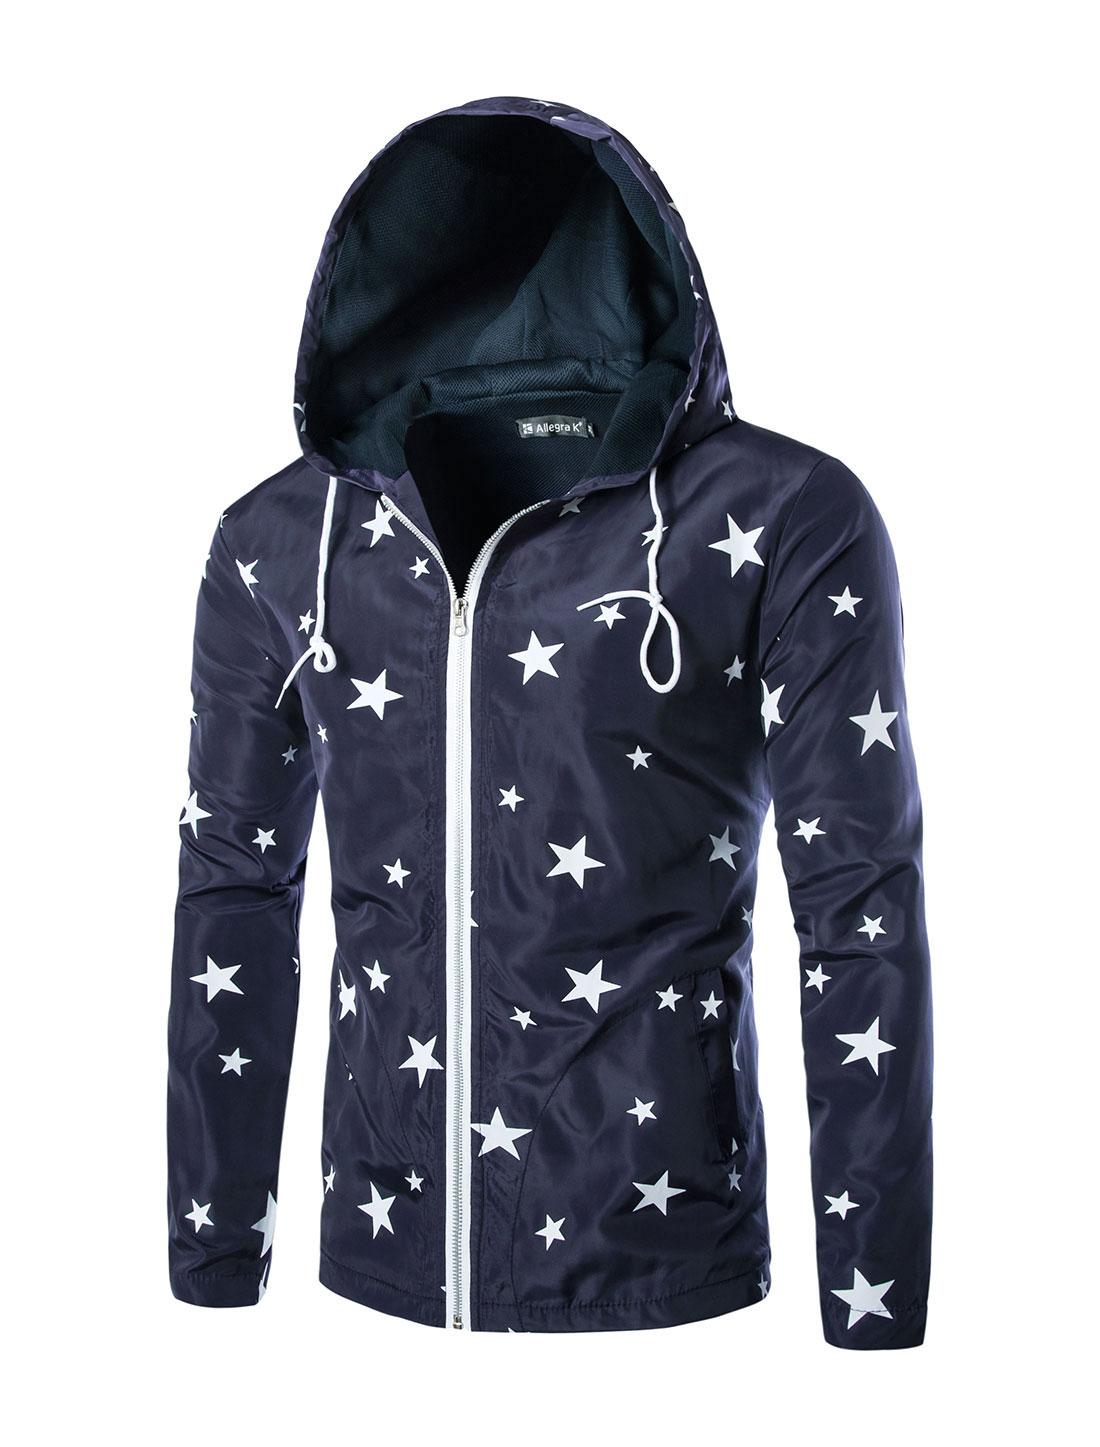 Men Long Sleeve Stars Prints Zipper Front Slim Fit Hoodies Navy Blue S